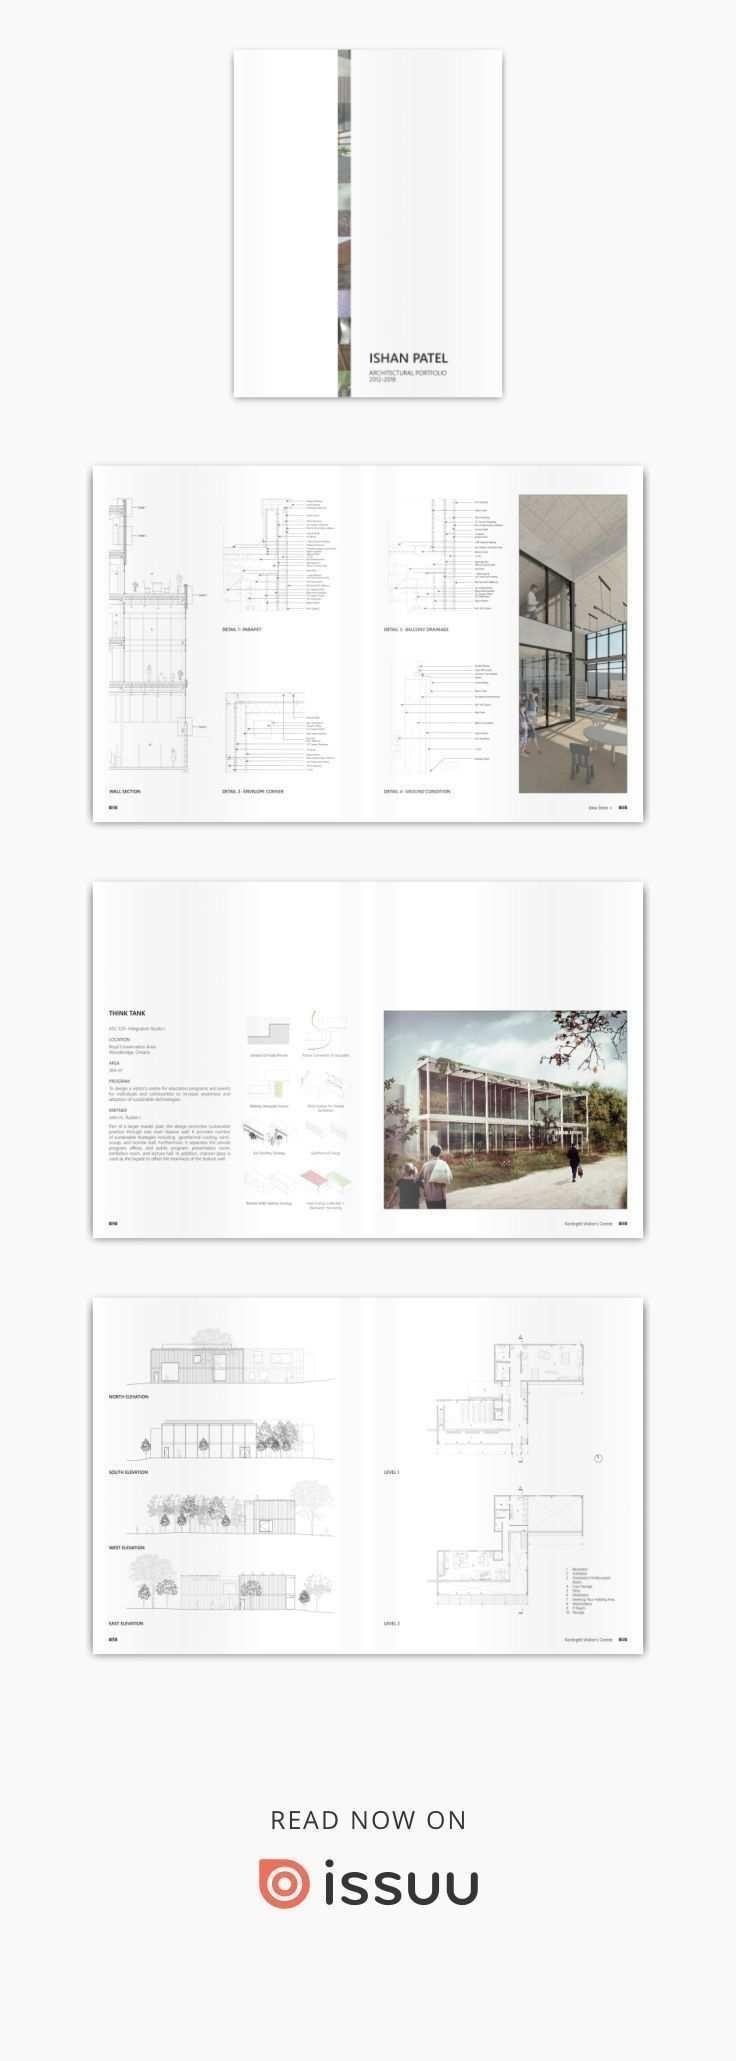 Architekturportfolio 2018 Architekturportfolio Portfolio In 2020 Architecture Portfolio Design Portfolio Design Layout Landscape Architecture Portfolio